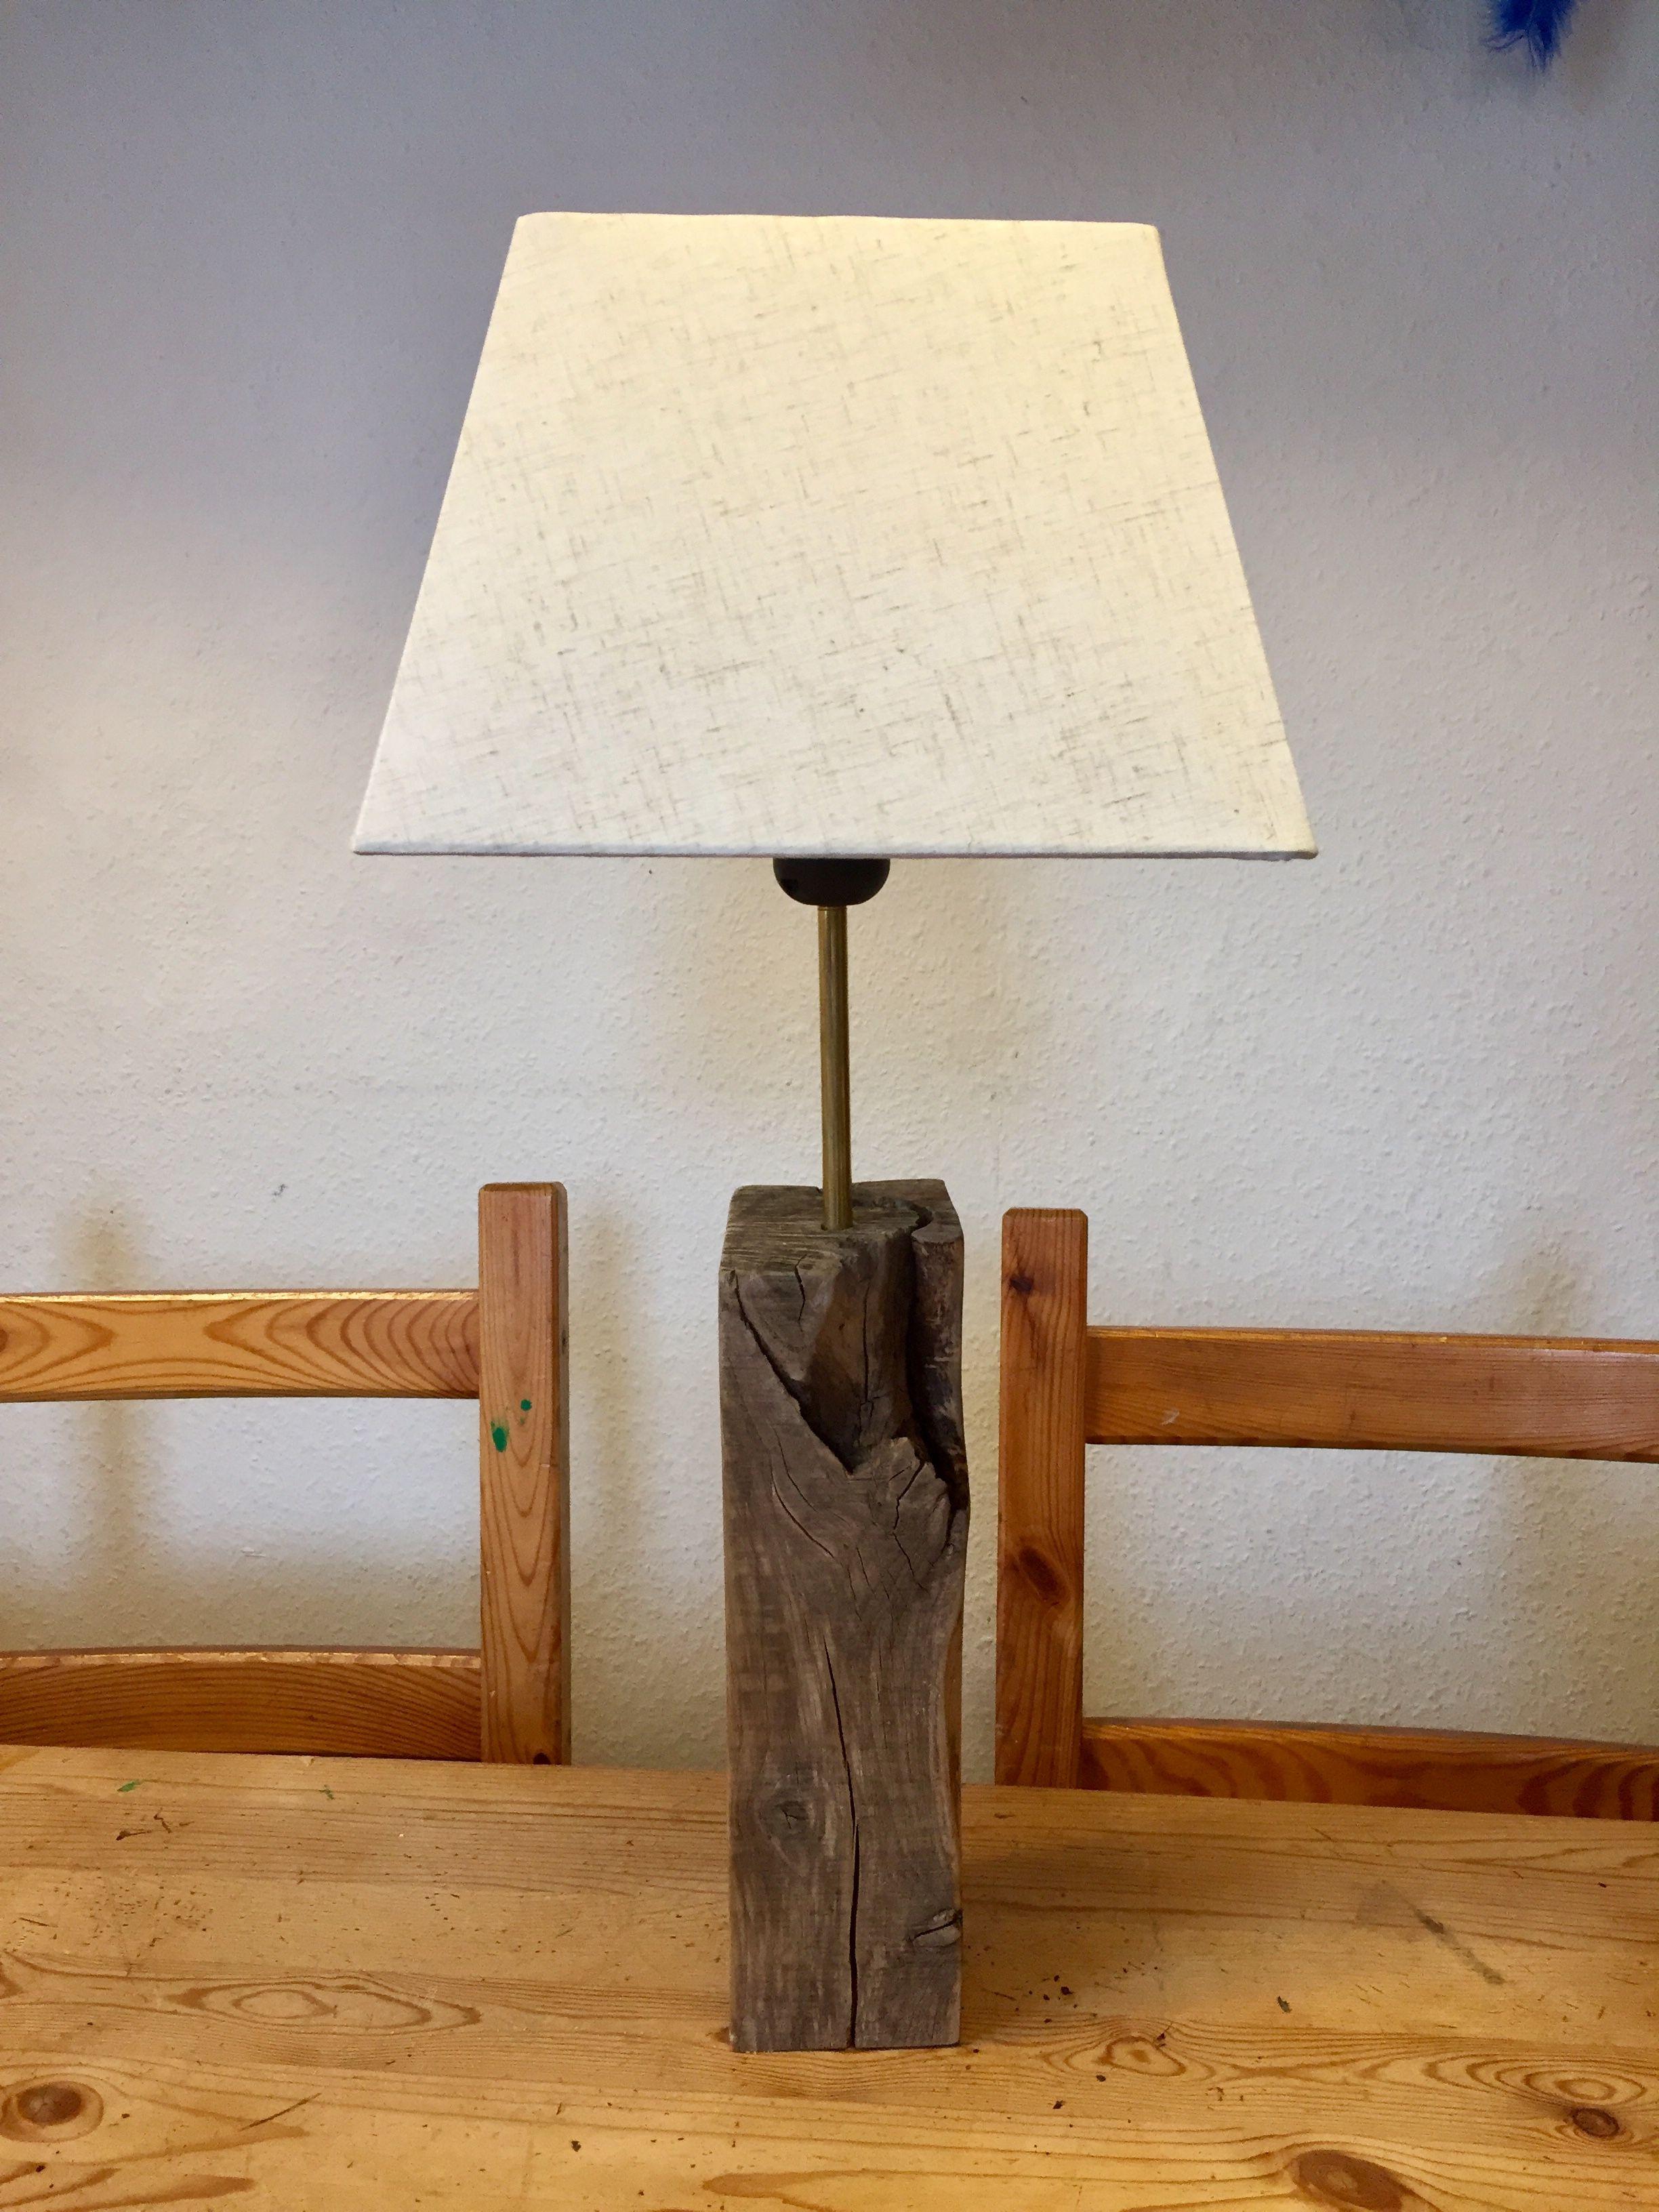 alter lighting. Alter Holzbalken Aus Der Toskana Lighting O